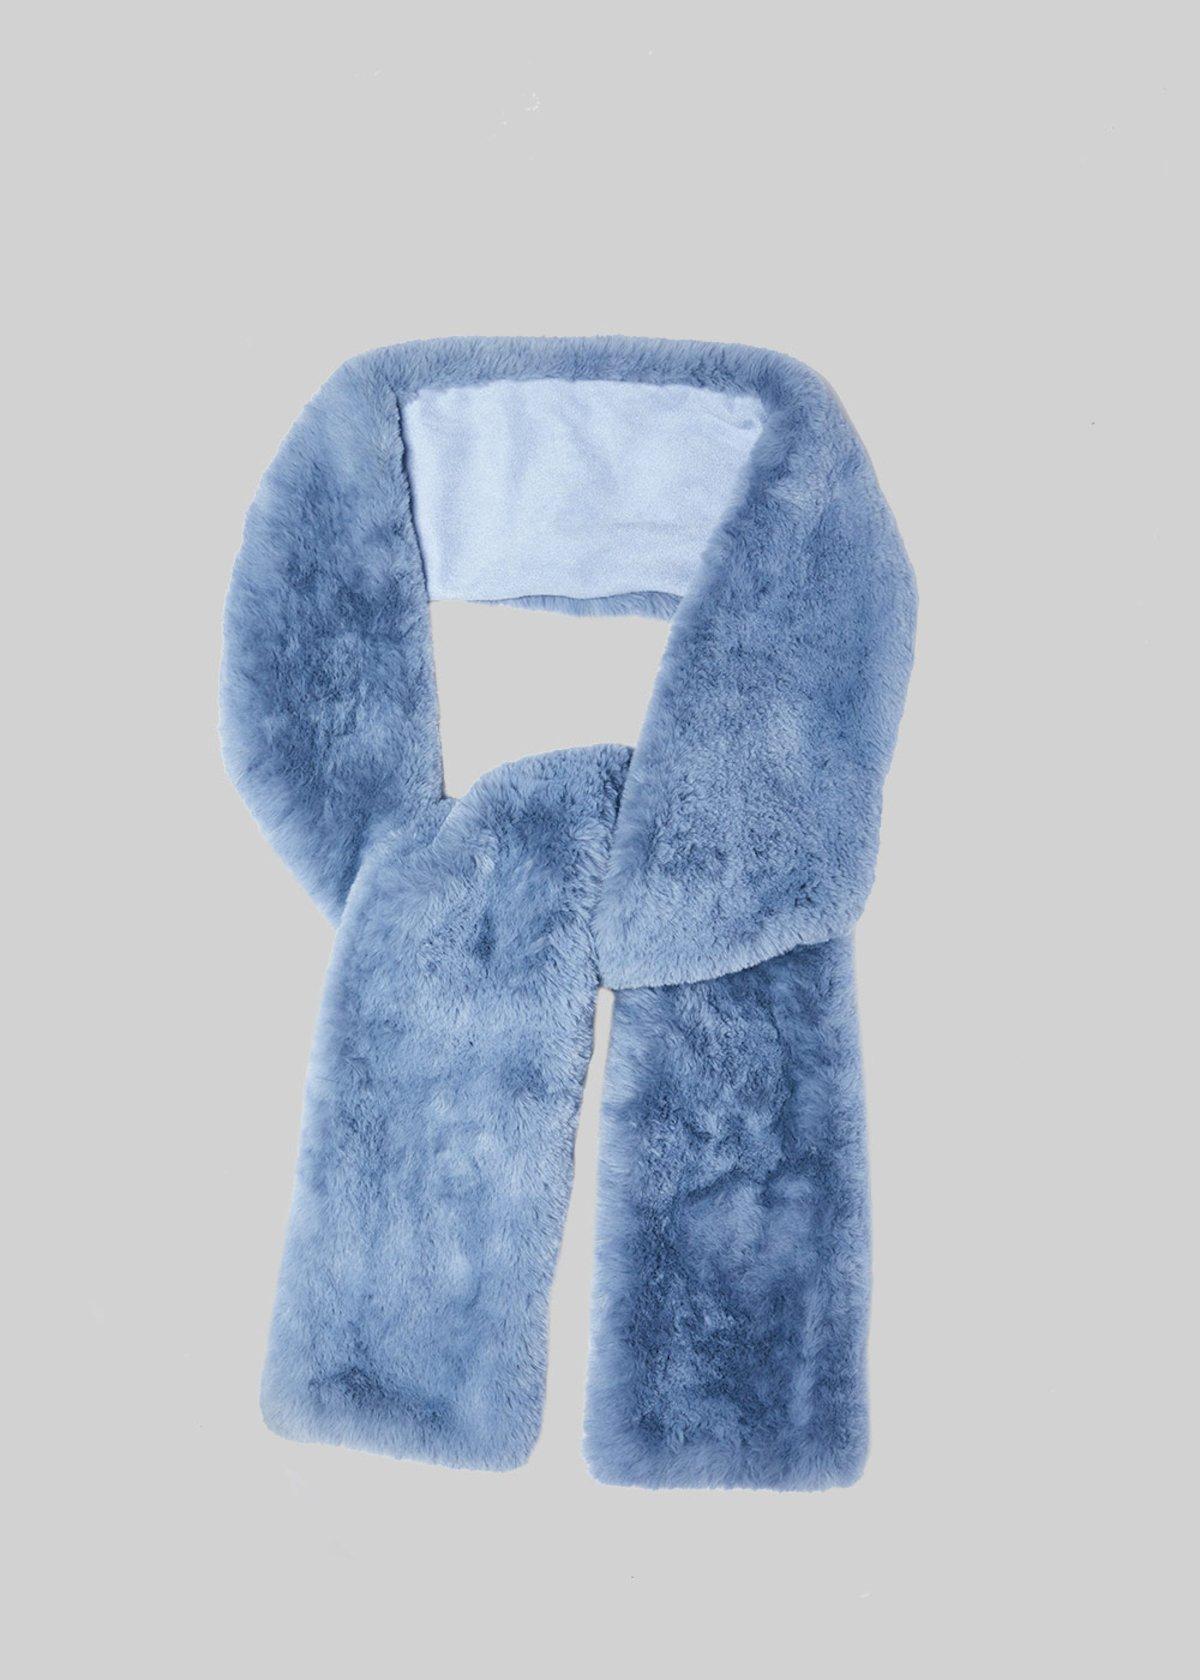 Selima fake fur neck warmer